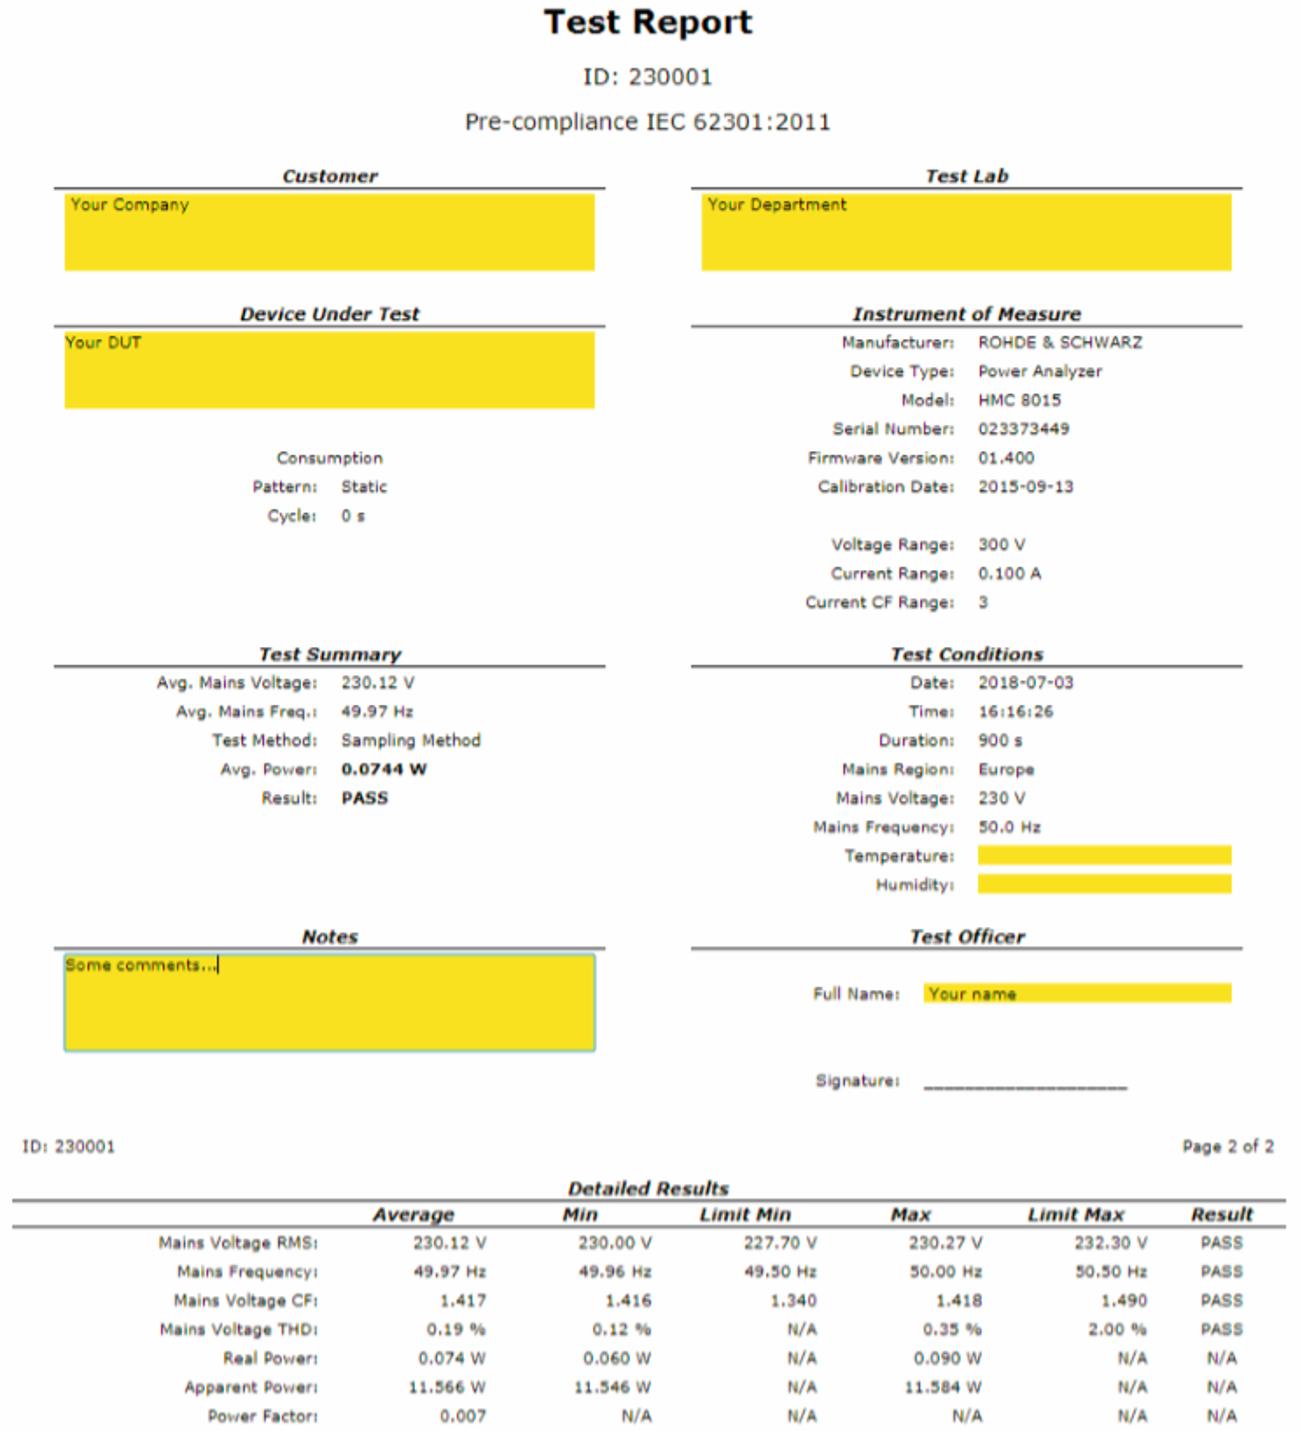 measurement-standby-power-consumption_ac_5216-1186-92_03.png